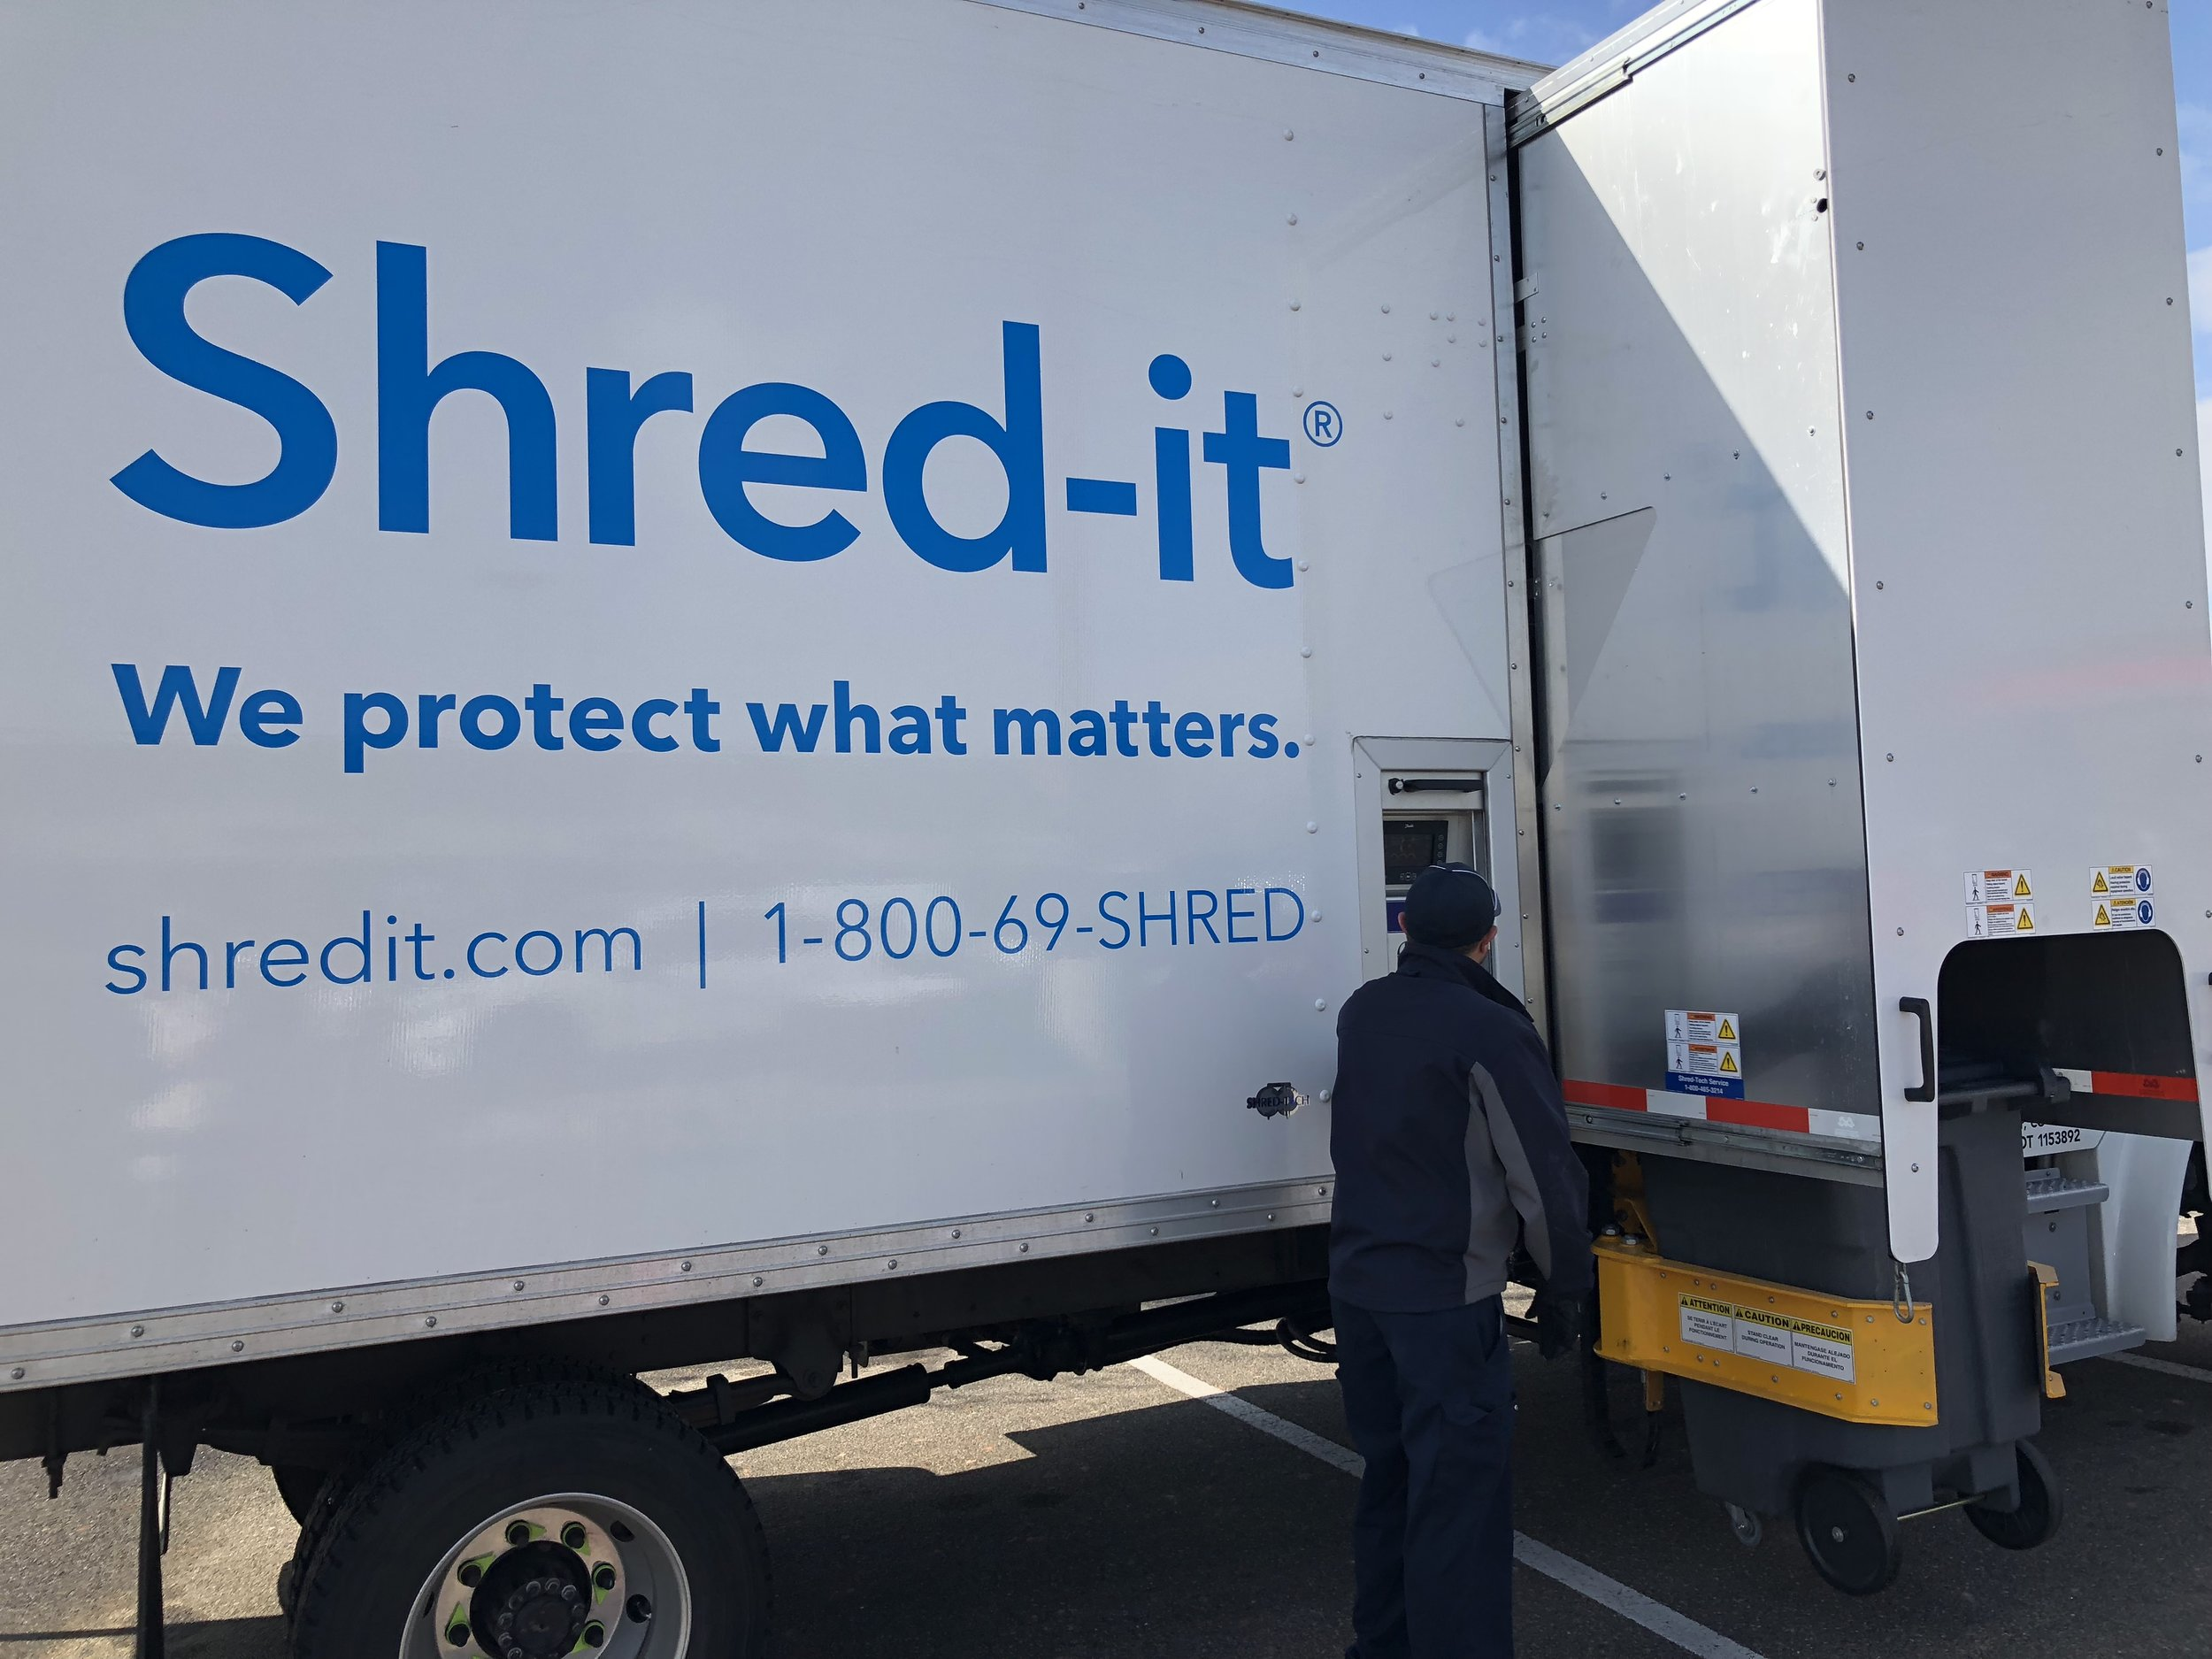 Shred-it Truck at Bengtson Wealth Management